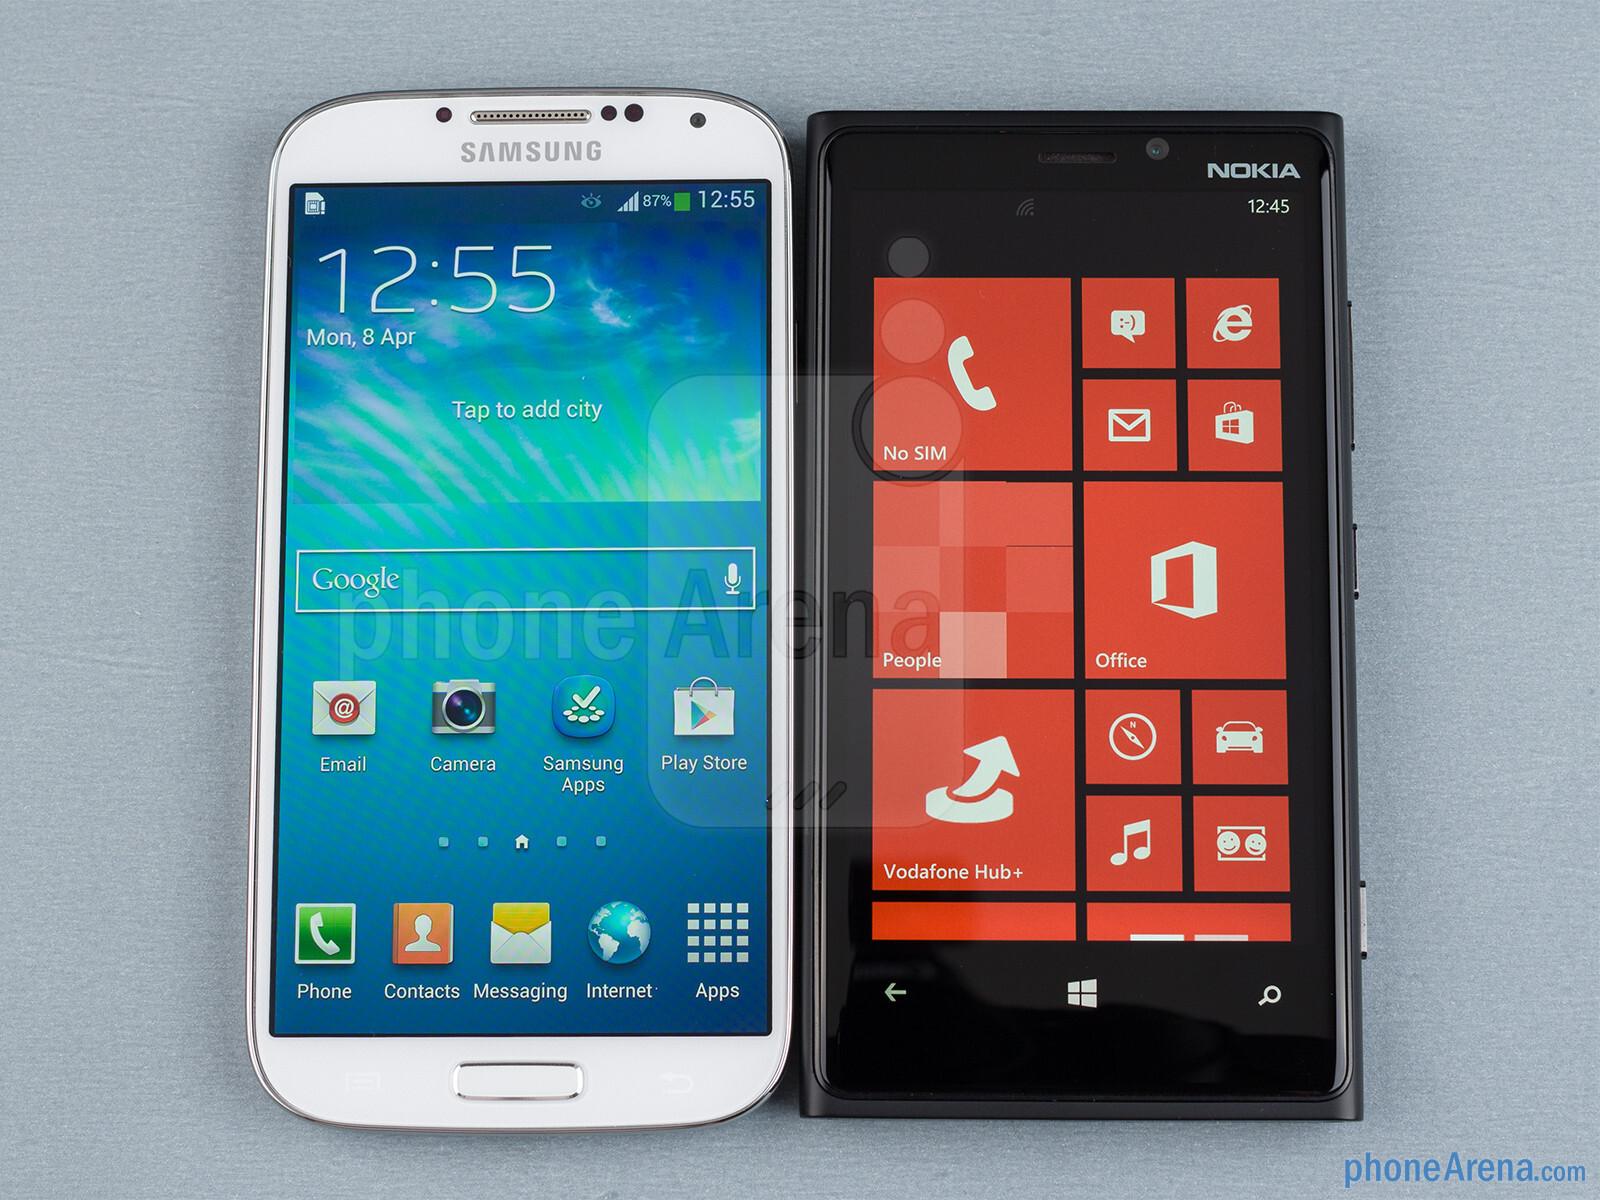 samsung galaxy s4 vs nokia lumia 920 phonearena. Black Bedroom Furniture Sets. Home Design Ideas